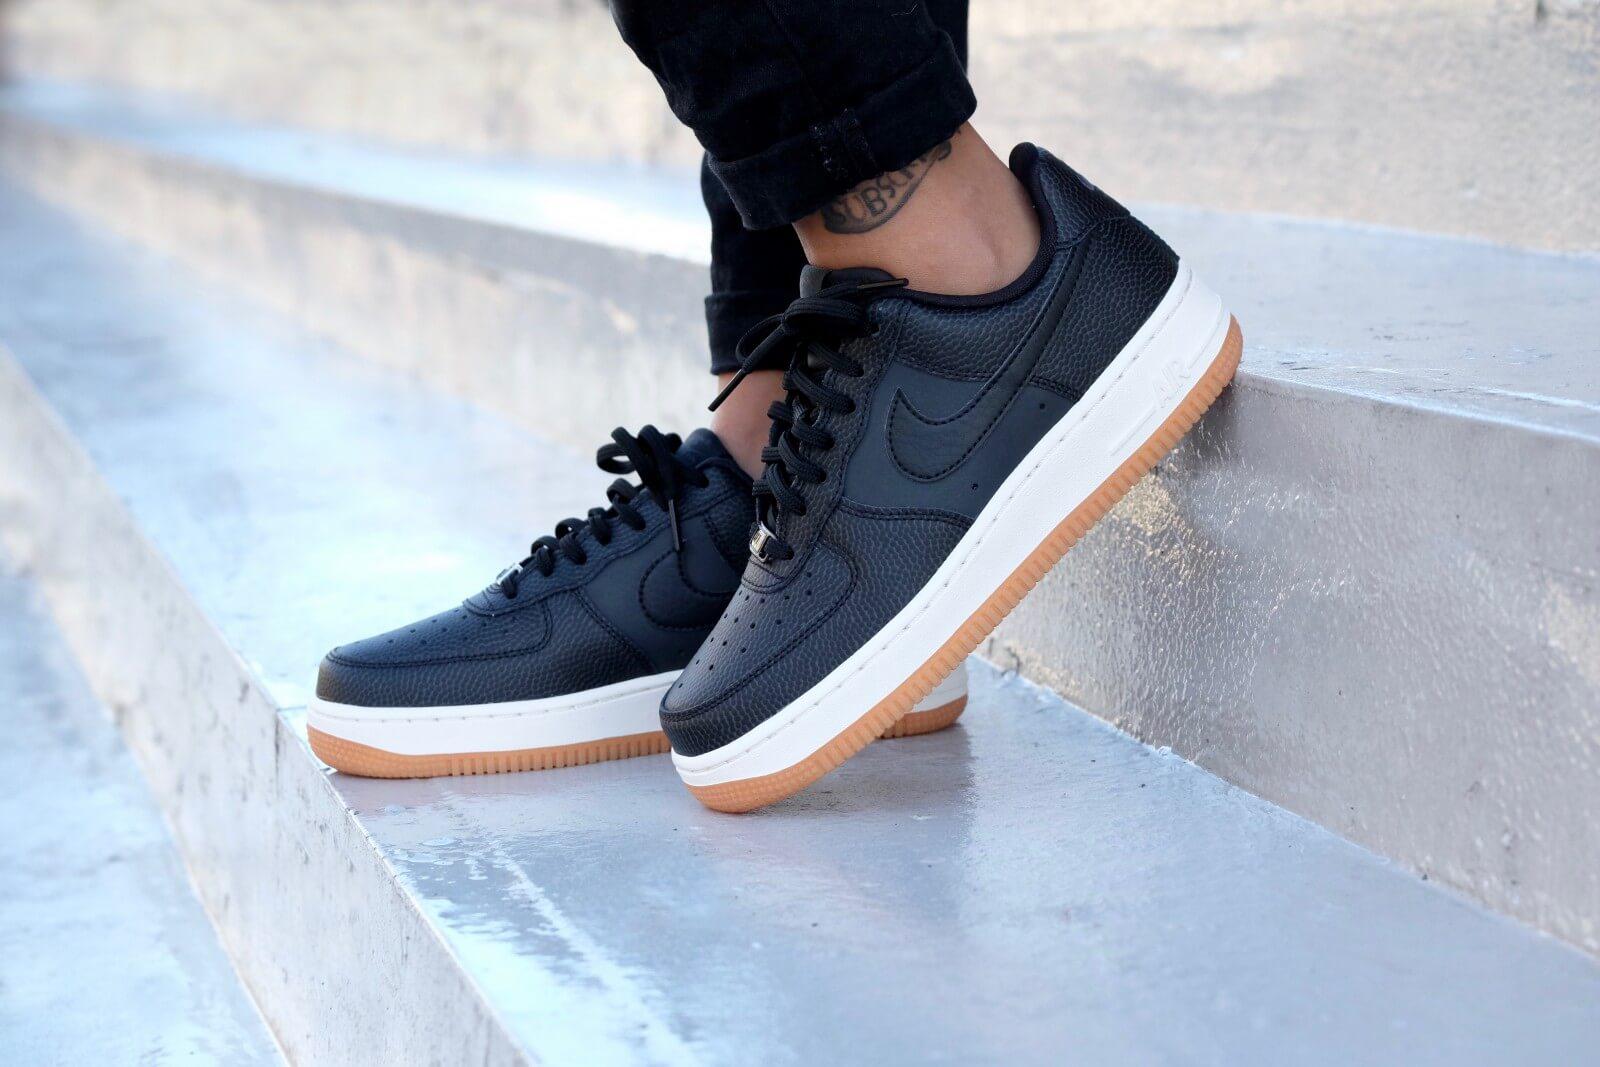 azúcar Divertidísimo Afilar  Nike WMNS Air Force 1 '07 Seasonal Black/ Black-Sail - 818594-003